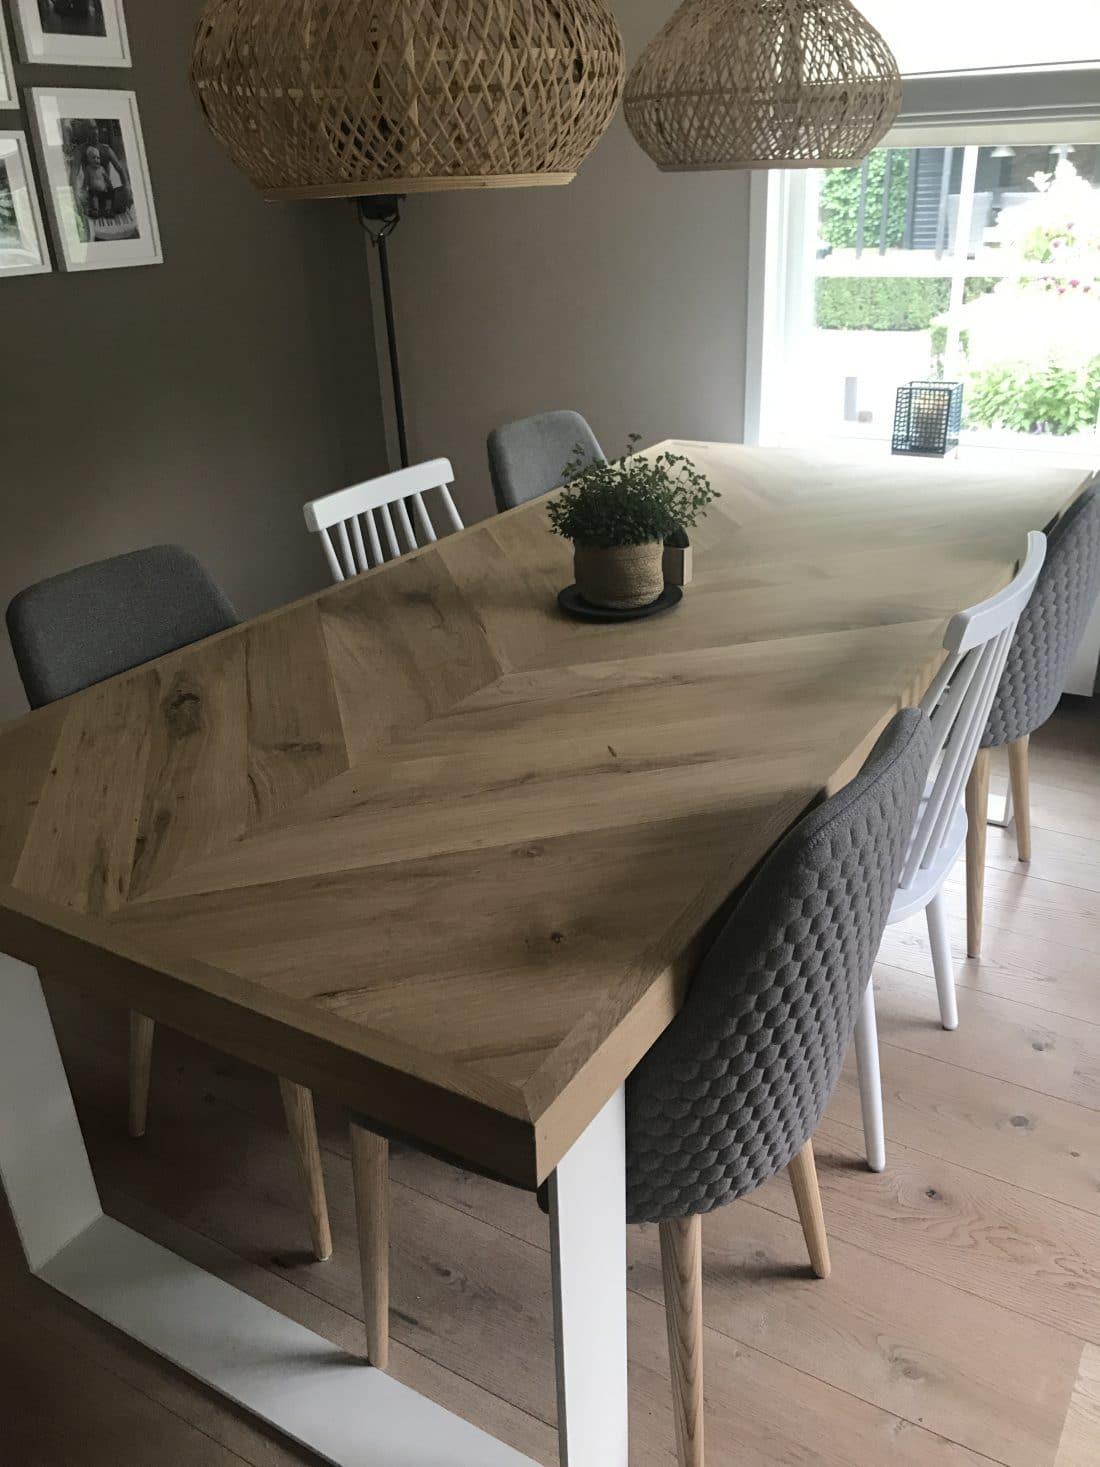 osla visgraat tafel